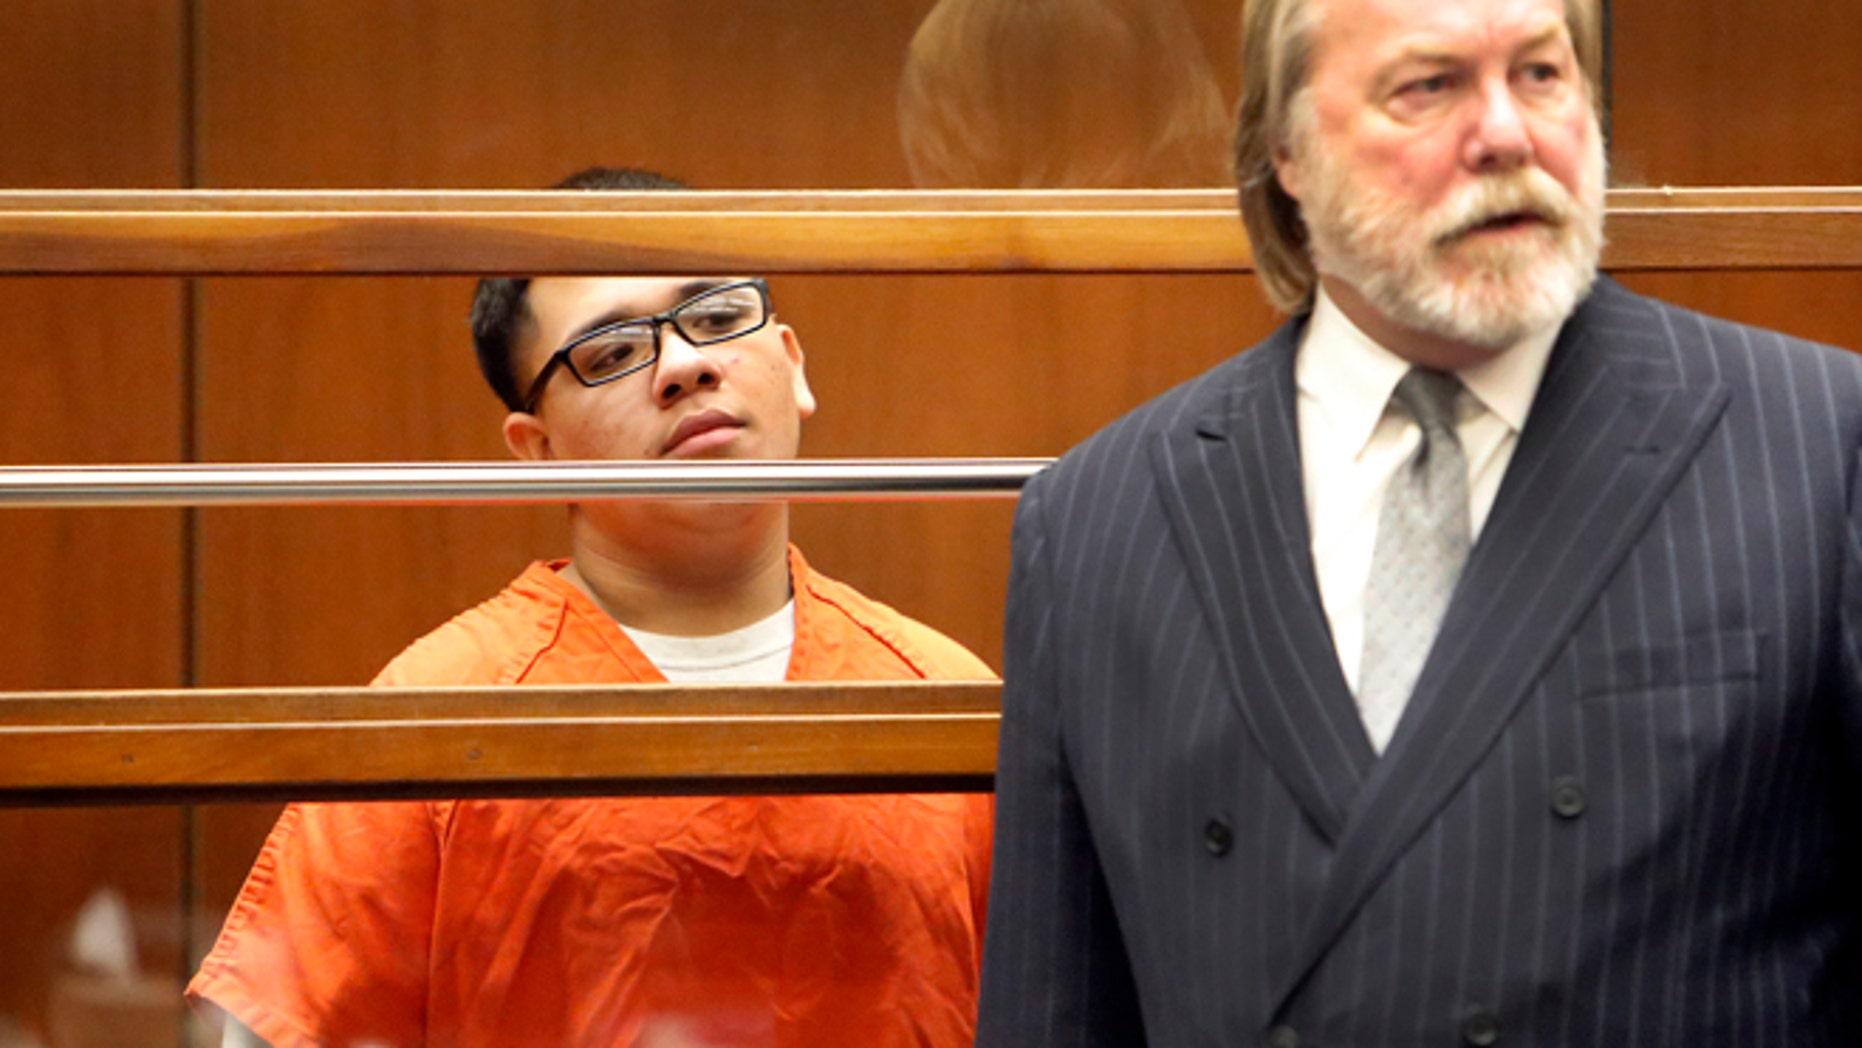 Alberto Ochoa in Los Angeles Superior Court Monday, Jan. 12, 2015 with his attorney.